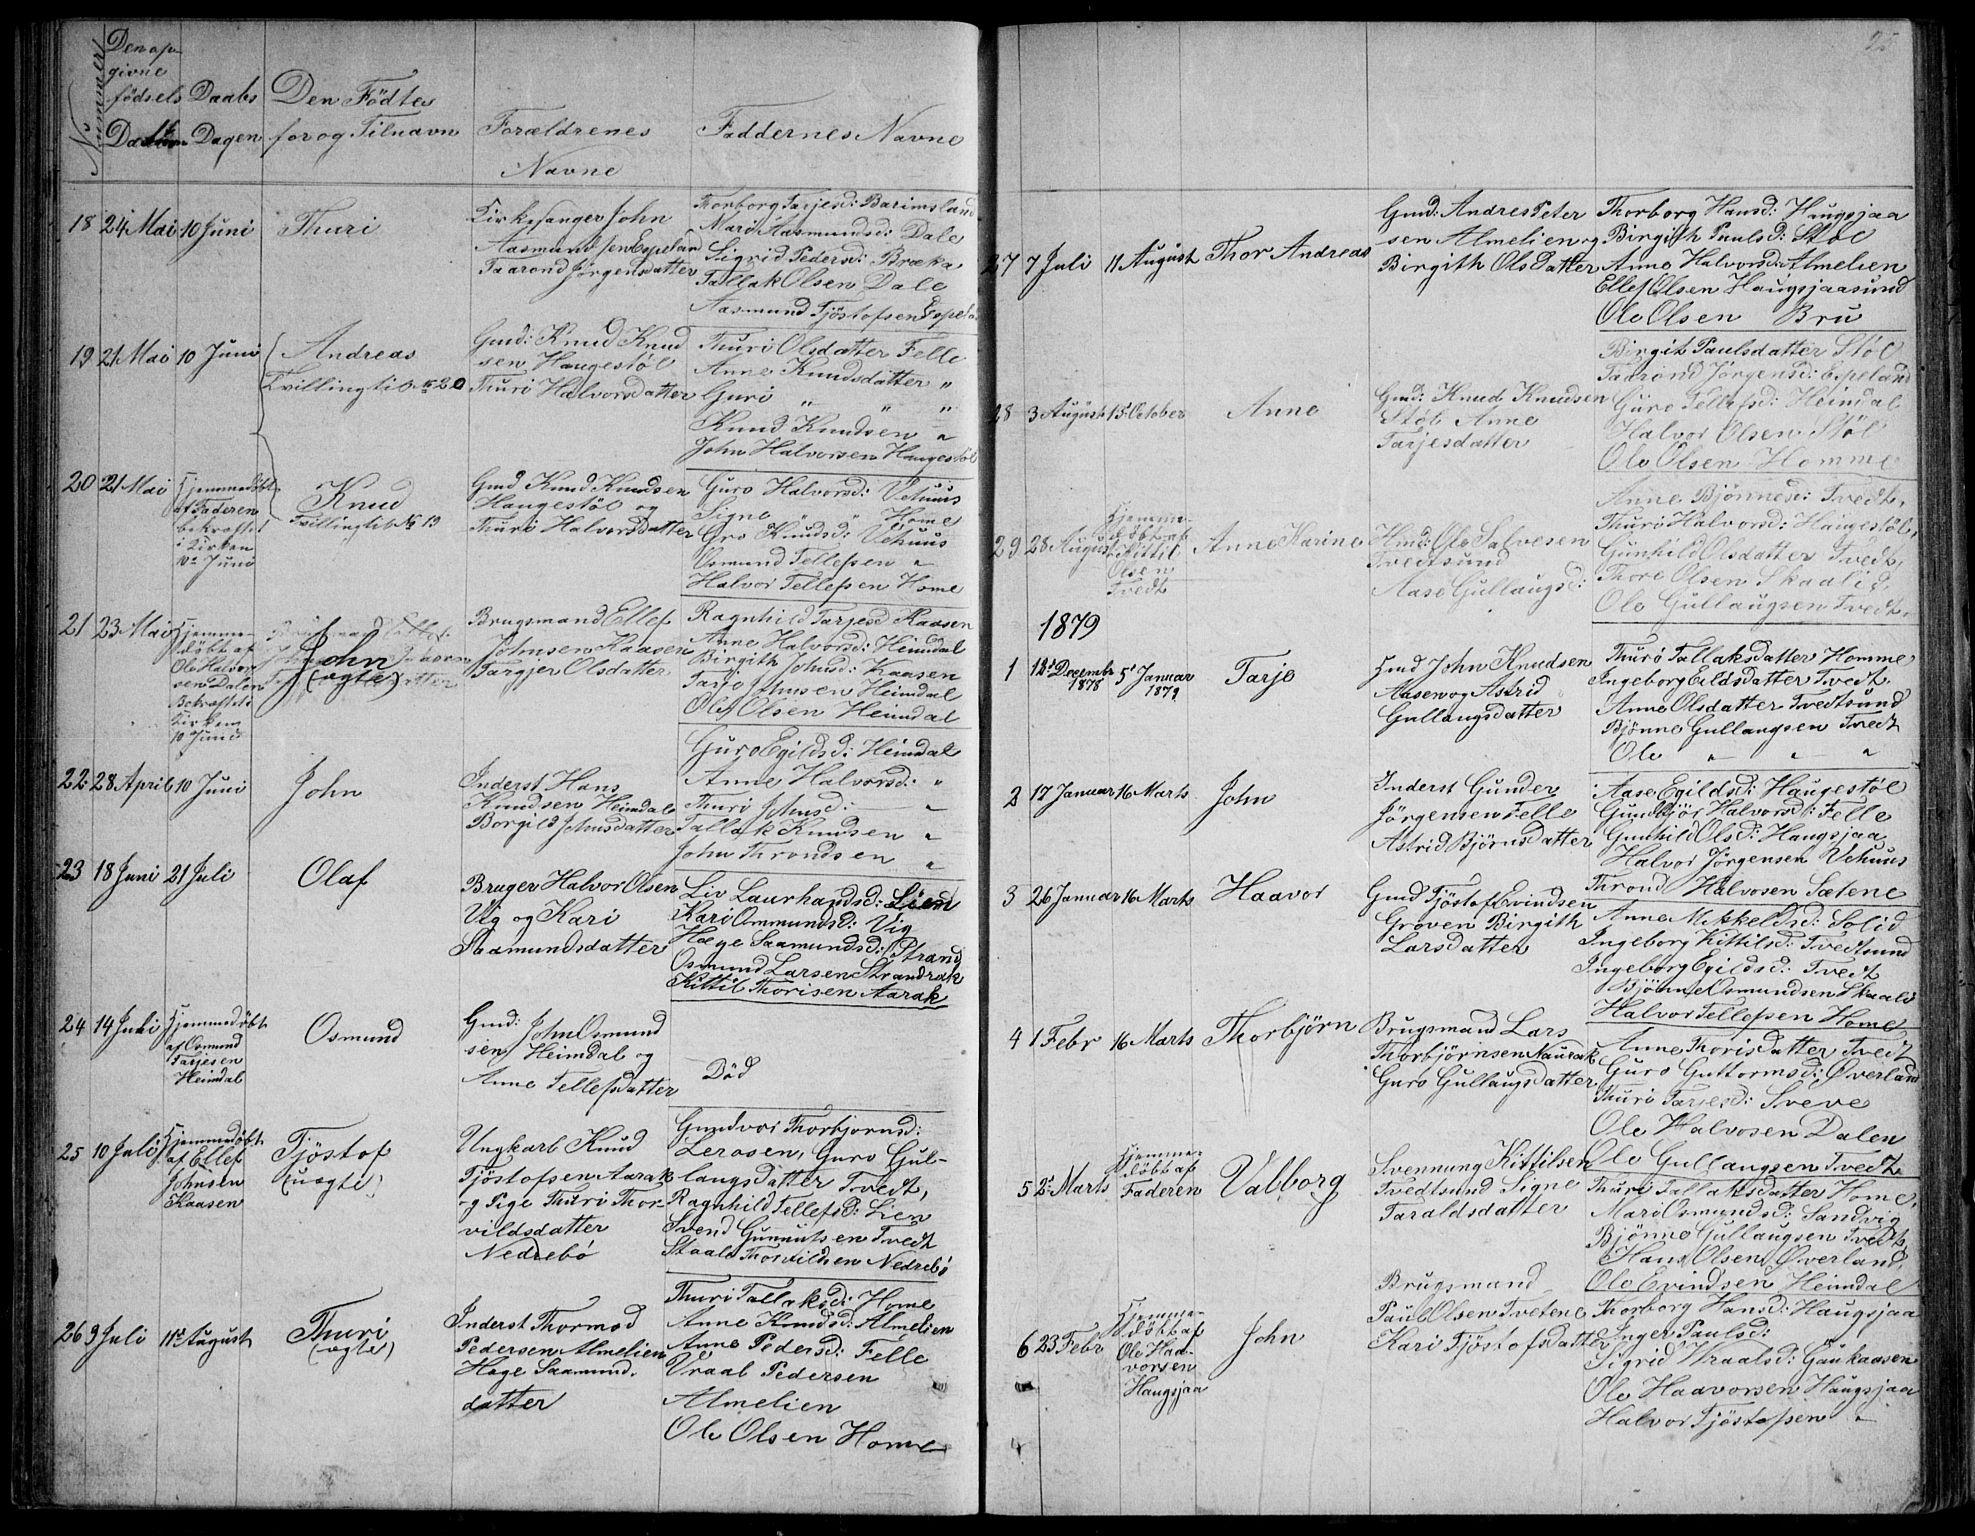 SAKO, Nissedal kirkebøker, G/Gb/L0002: Klokkerbok nr. II 2, 1863-1892, s. 25